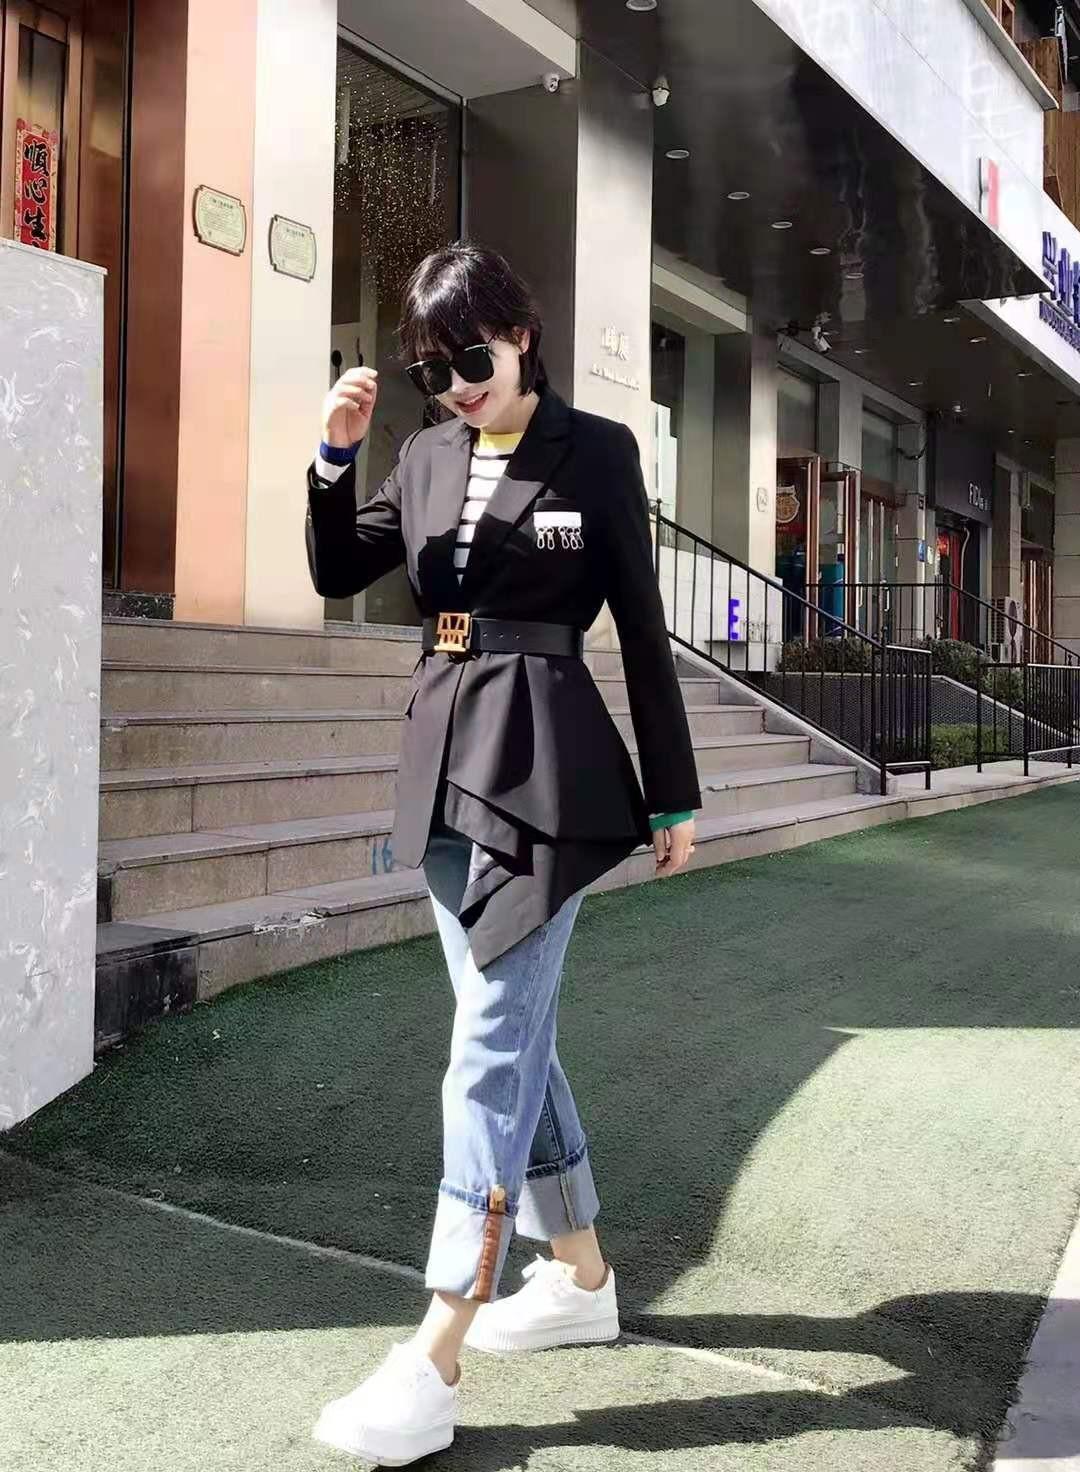 WSN品牌女装打造超级社群 让时尚和美与您同行